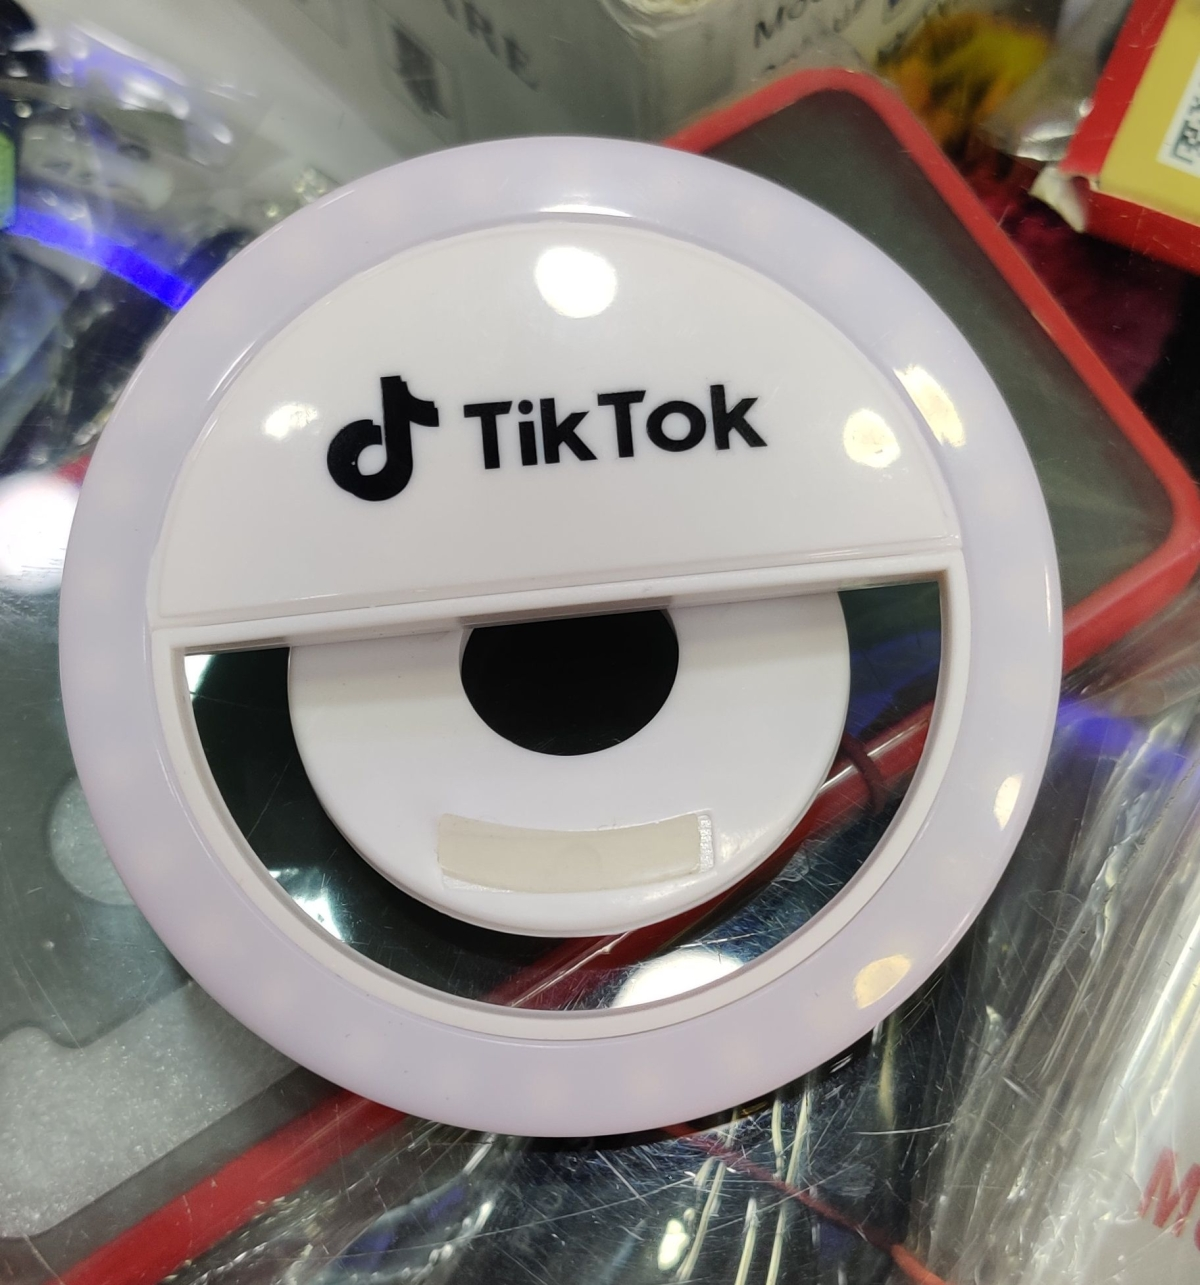 A ring light with TikTok branding on it